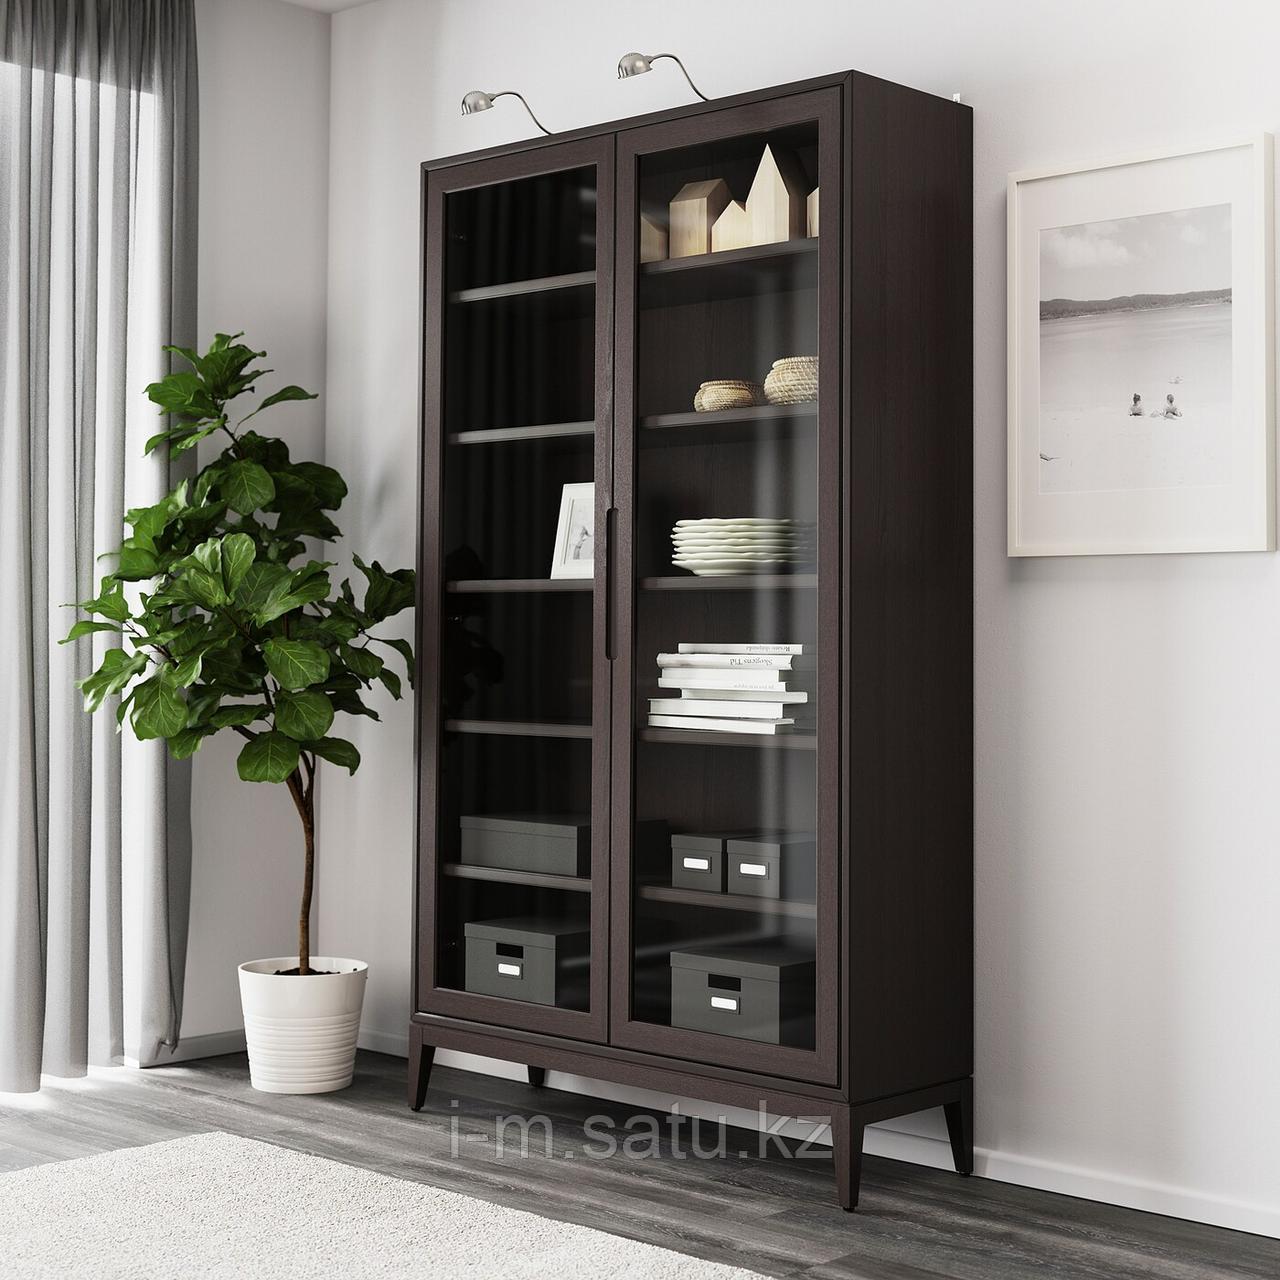 РЕЖИССЁР Шкаф-витрина, коричневый, 118x203 см